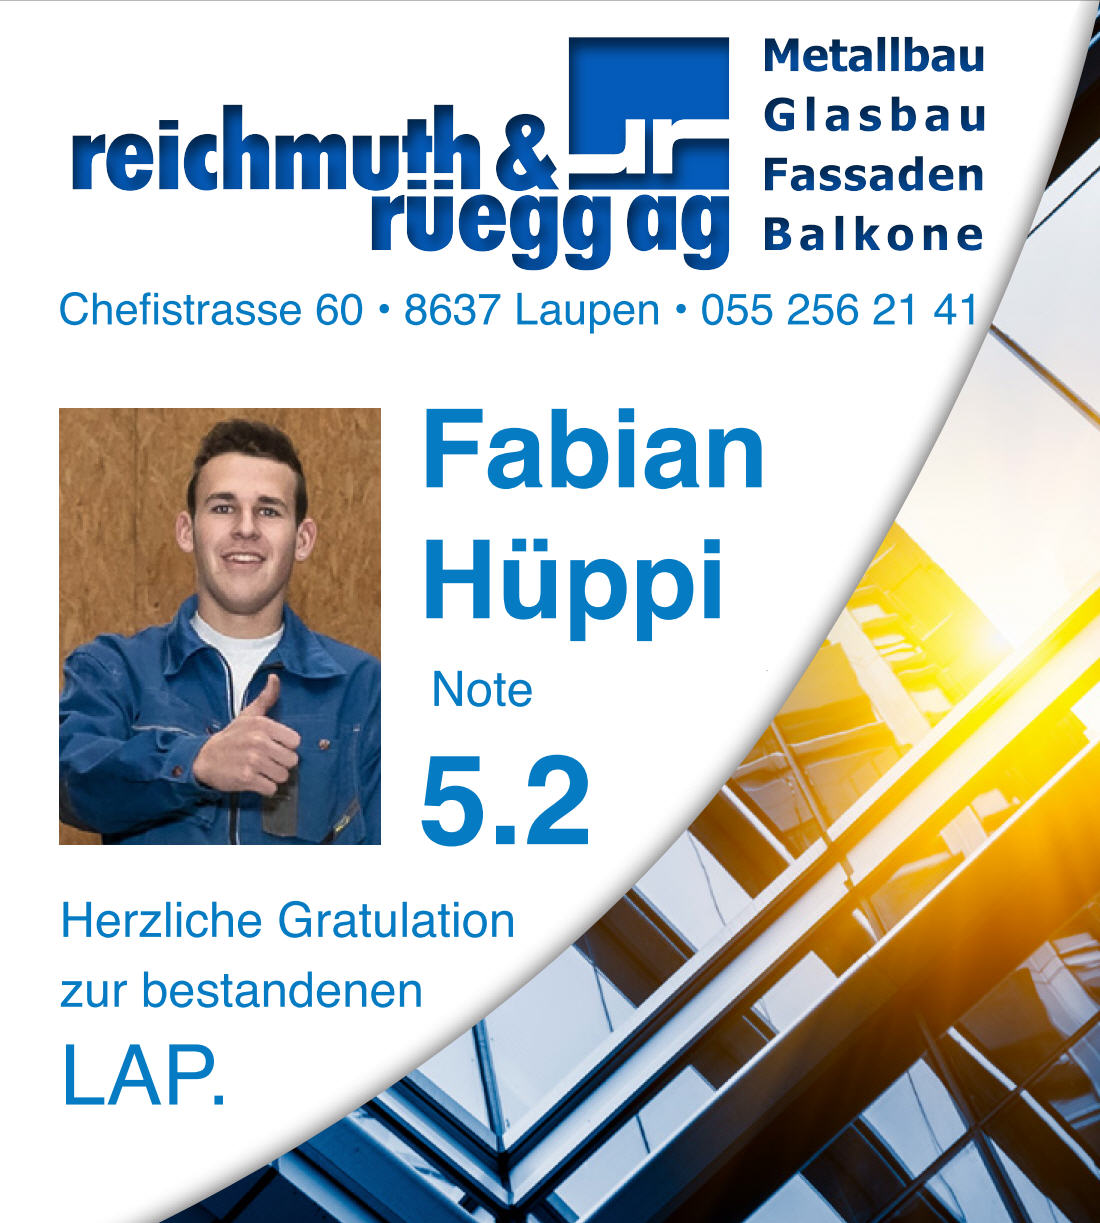 Fabian Hüppi - Lehrabschlussprüfung Note 5.2 - Metallbau